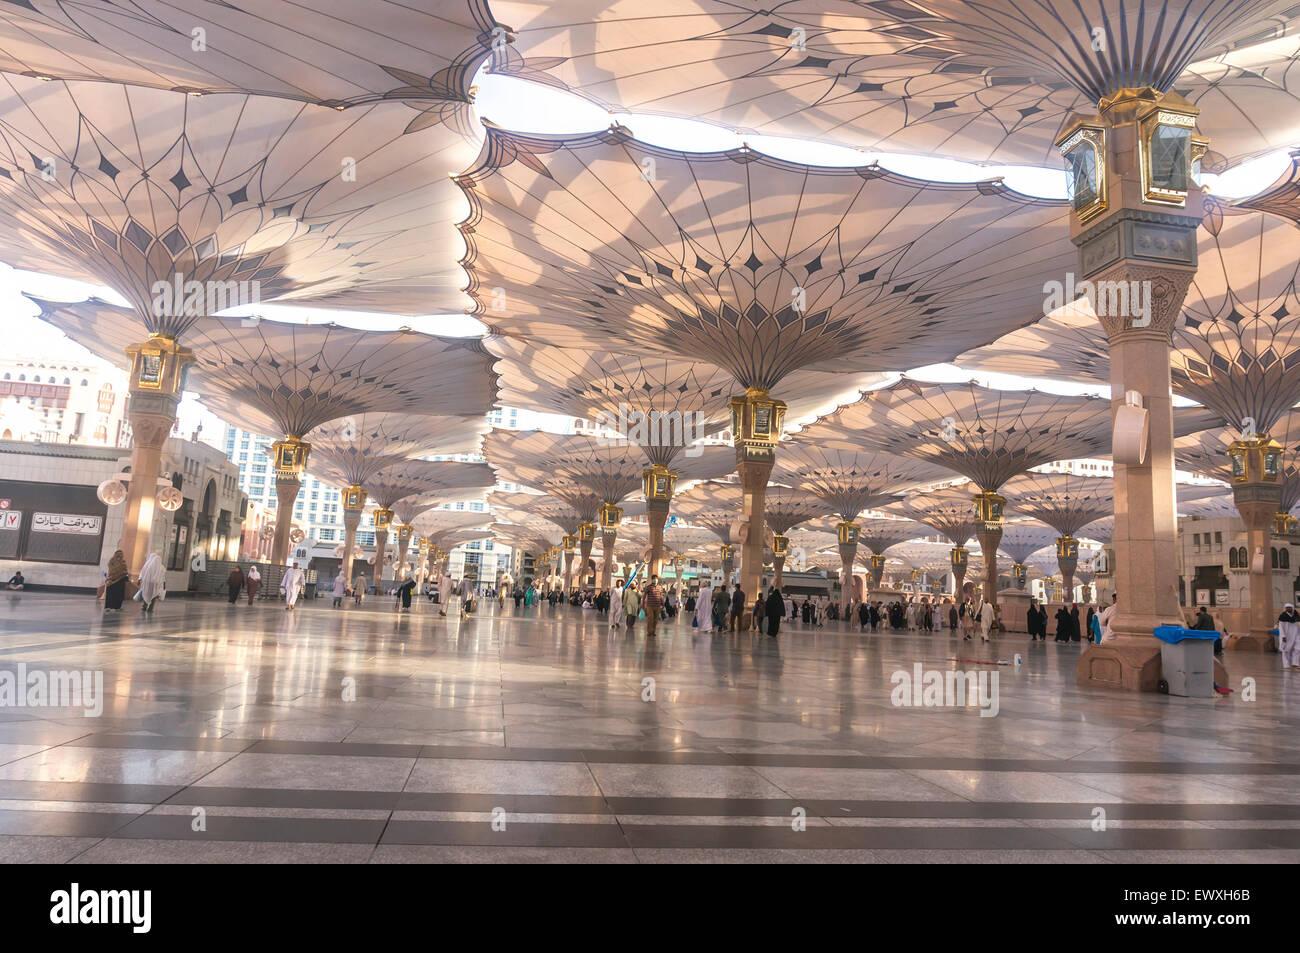 MEDINA, SAUDI ARABIA - MARCH 06, 2015 : Pilgrims walk ...